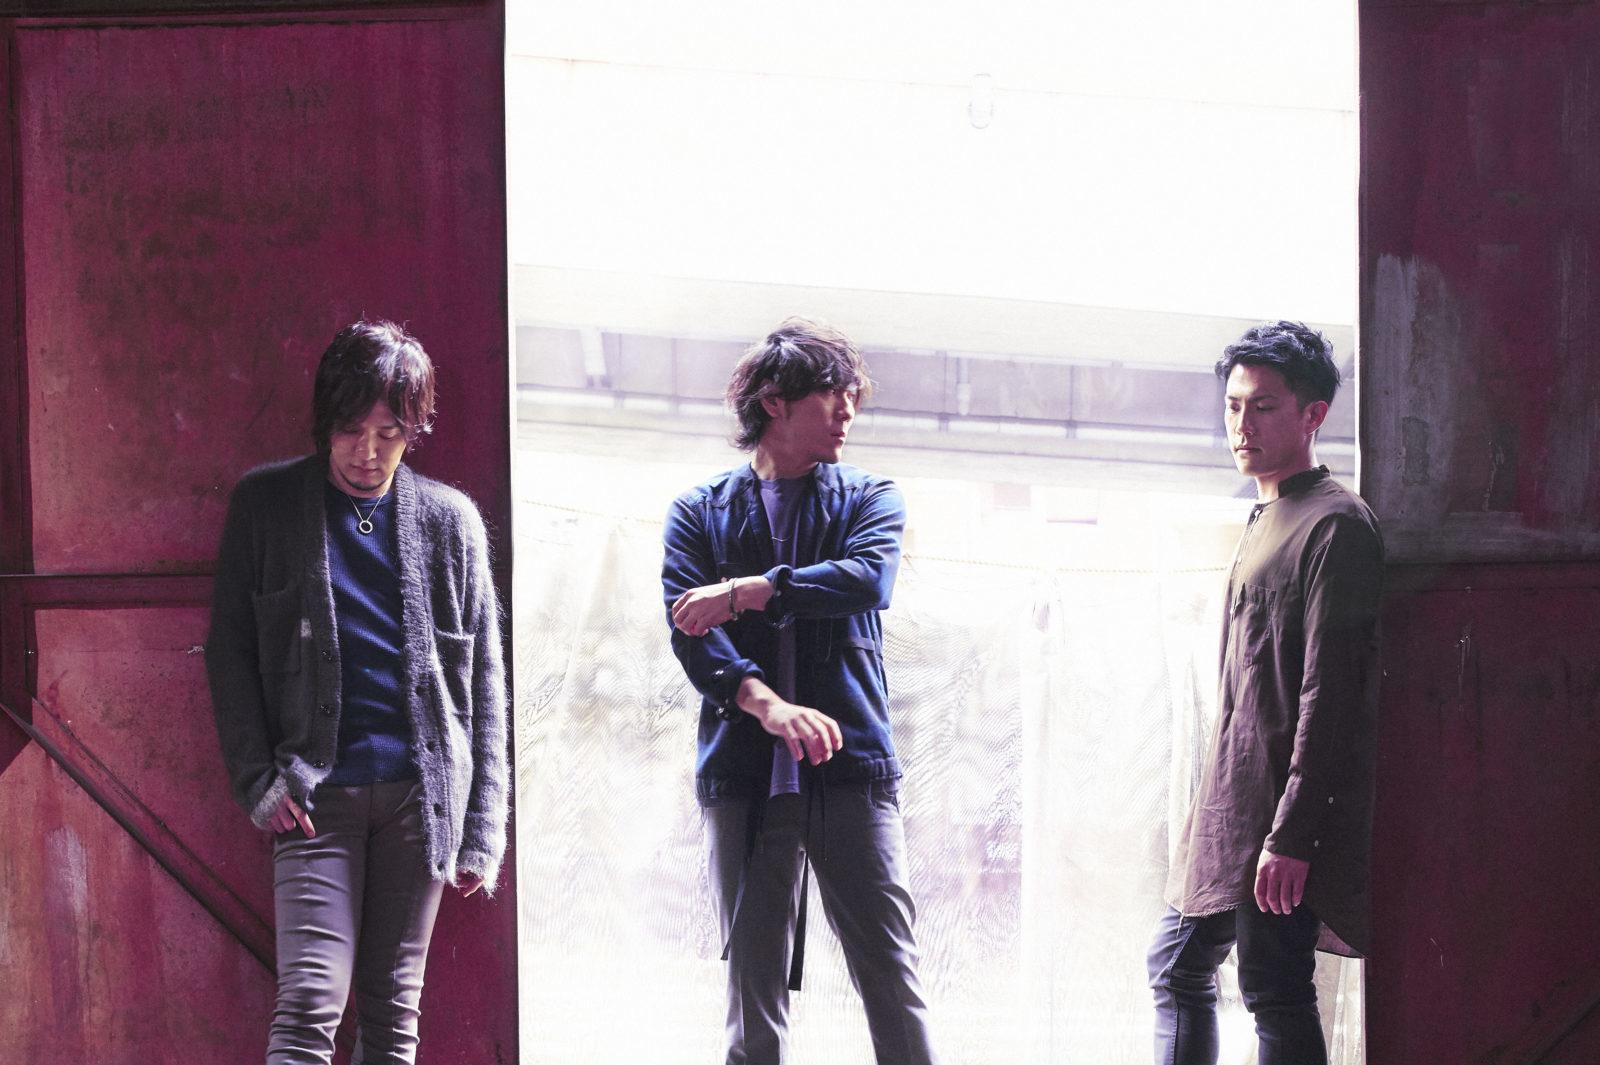 D-LITE(from BIGBANG)、lol-エルオーエル-もランクイン!今注目の歌詞ランキング1位は、あの超人気バンドの佐藤健×土屋太鳳の出演映画主題歌